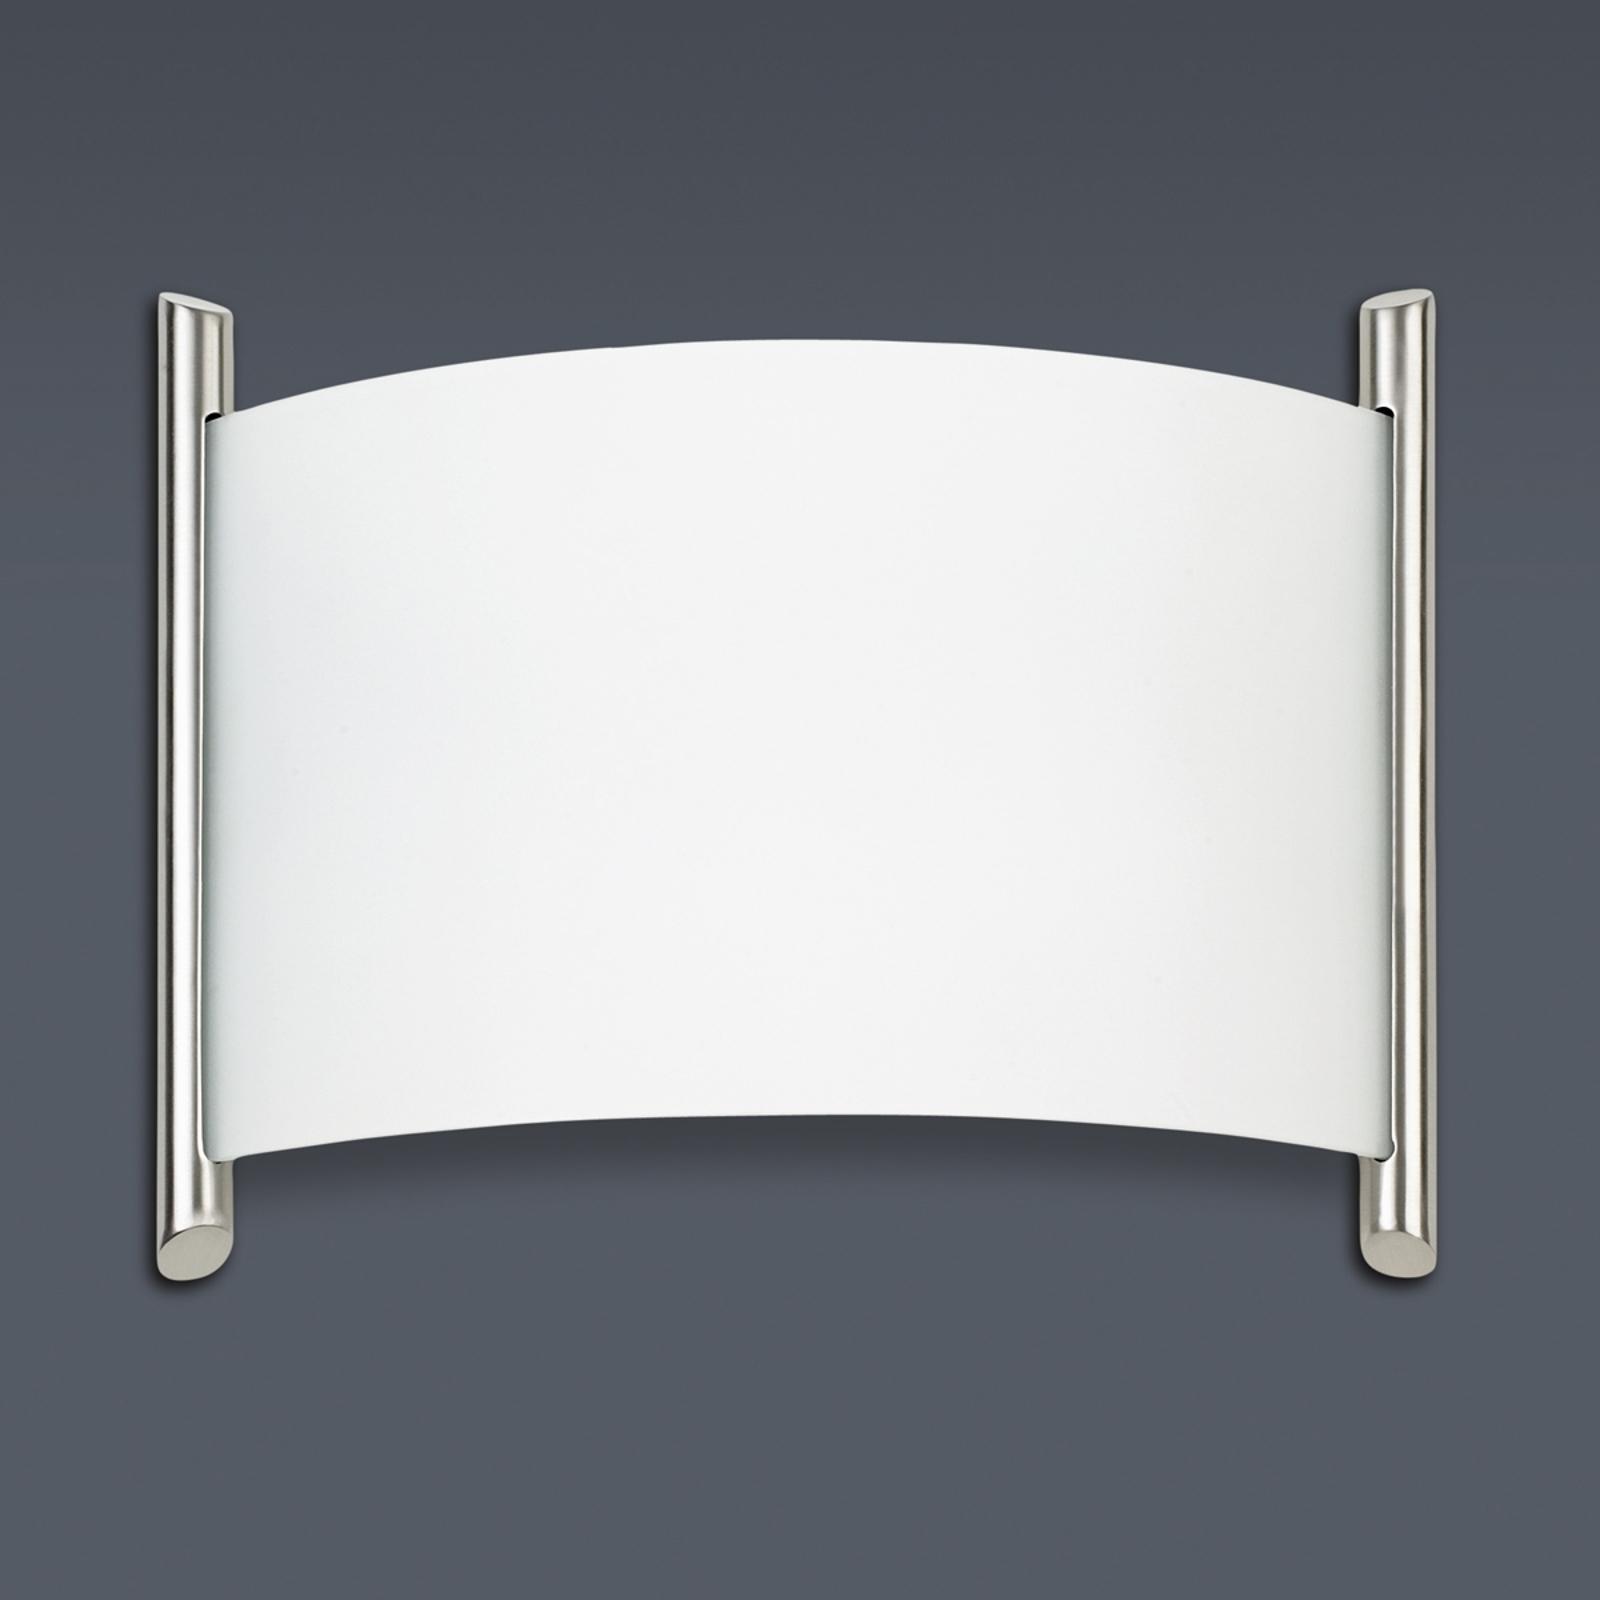 Wandlamp NIZA met gesatineerd glas